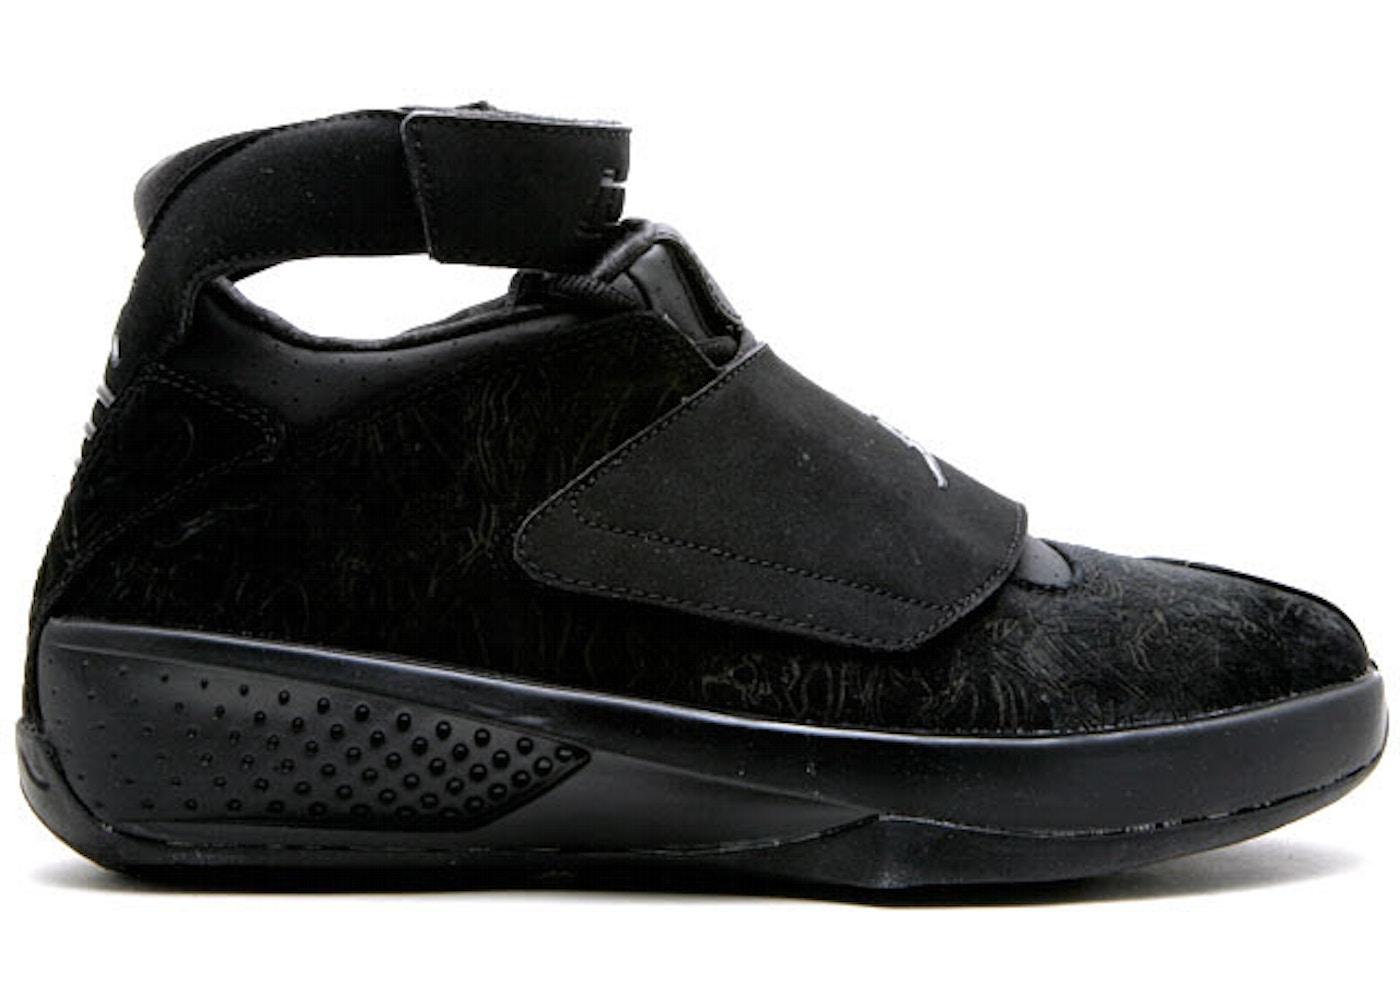 a52b8e0498d3 Buy Air Jordan 20 Shoes   Deadstock Sneakers